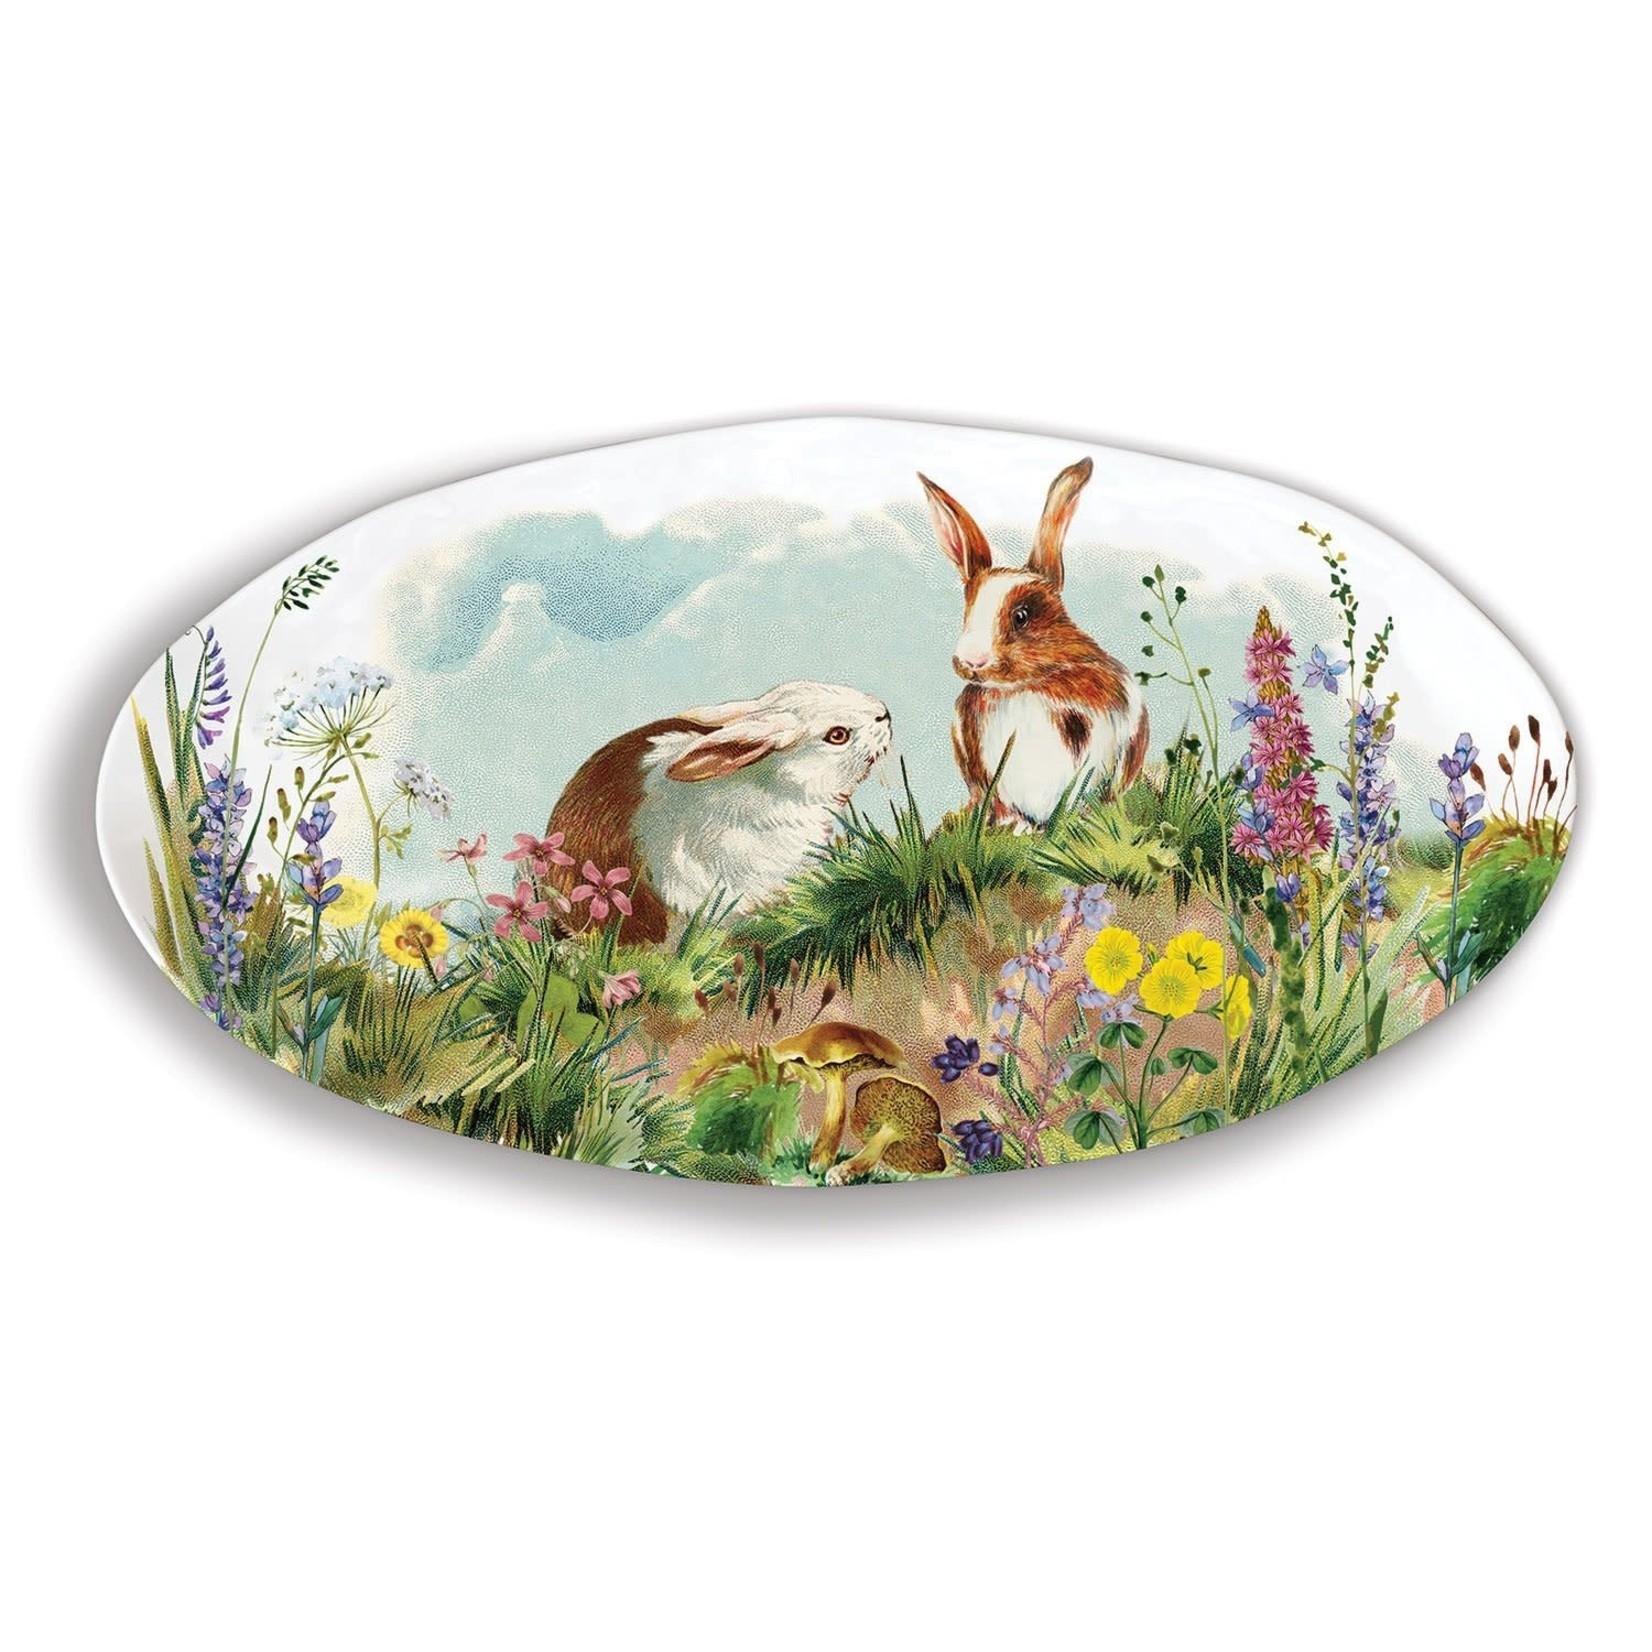 Michel Design Works Bunny Hollow Melamine Oval Platter